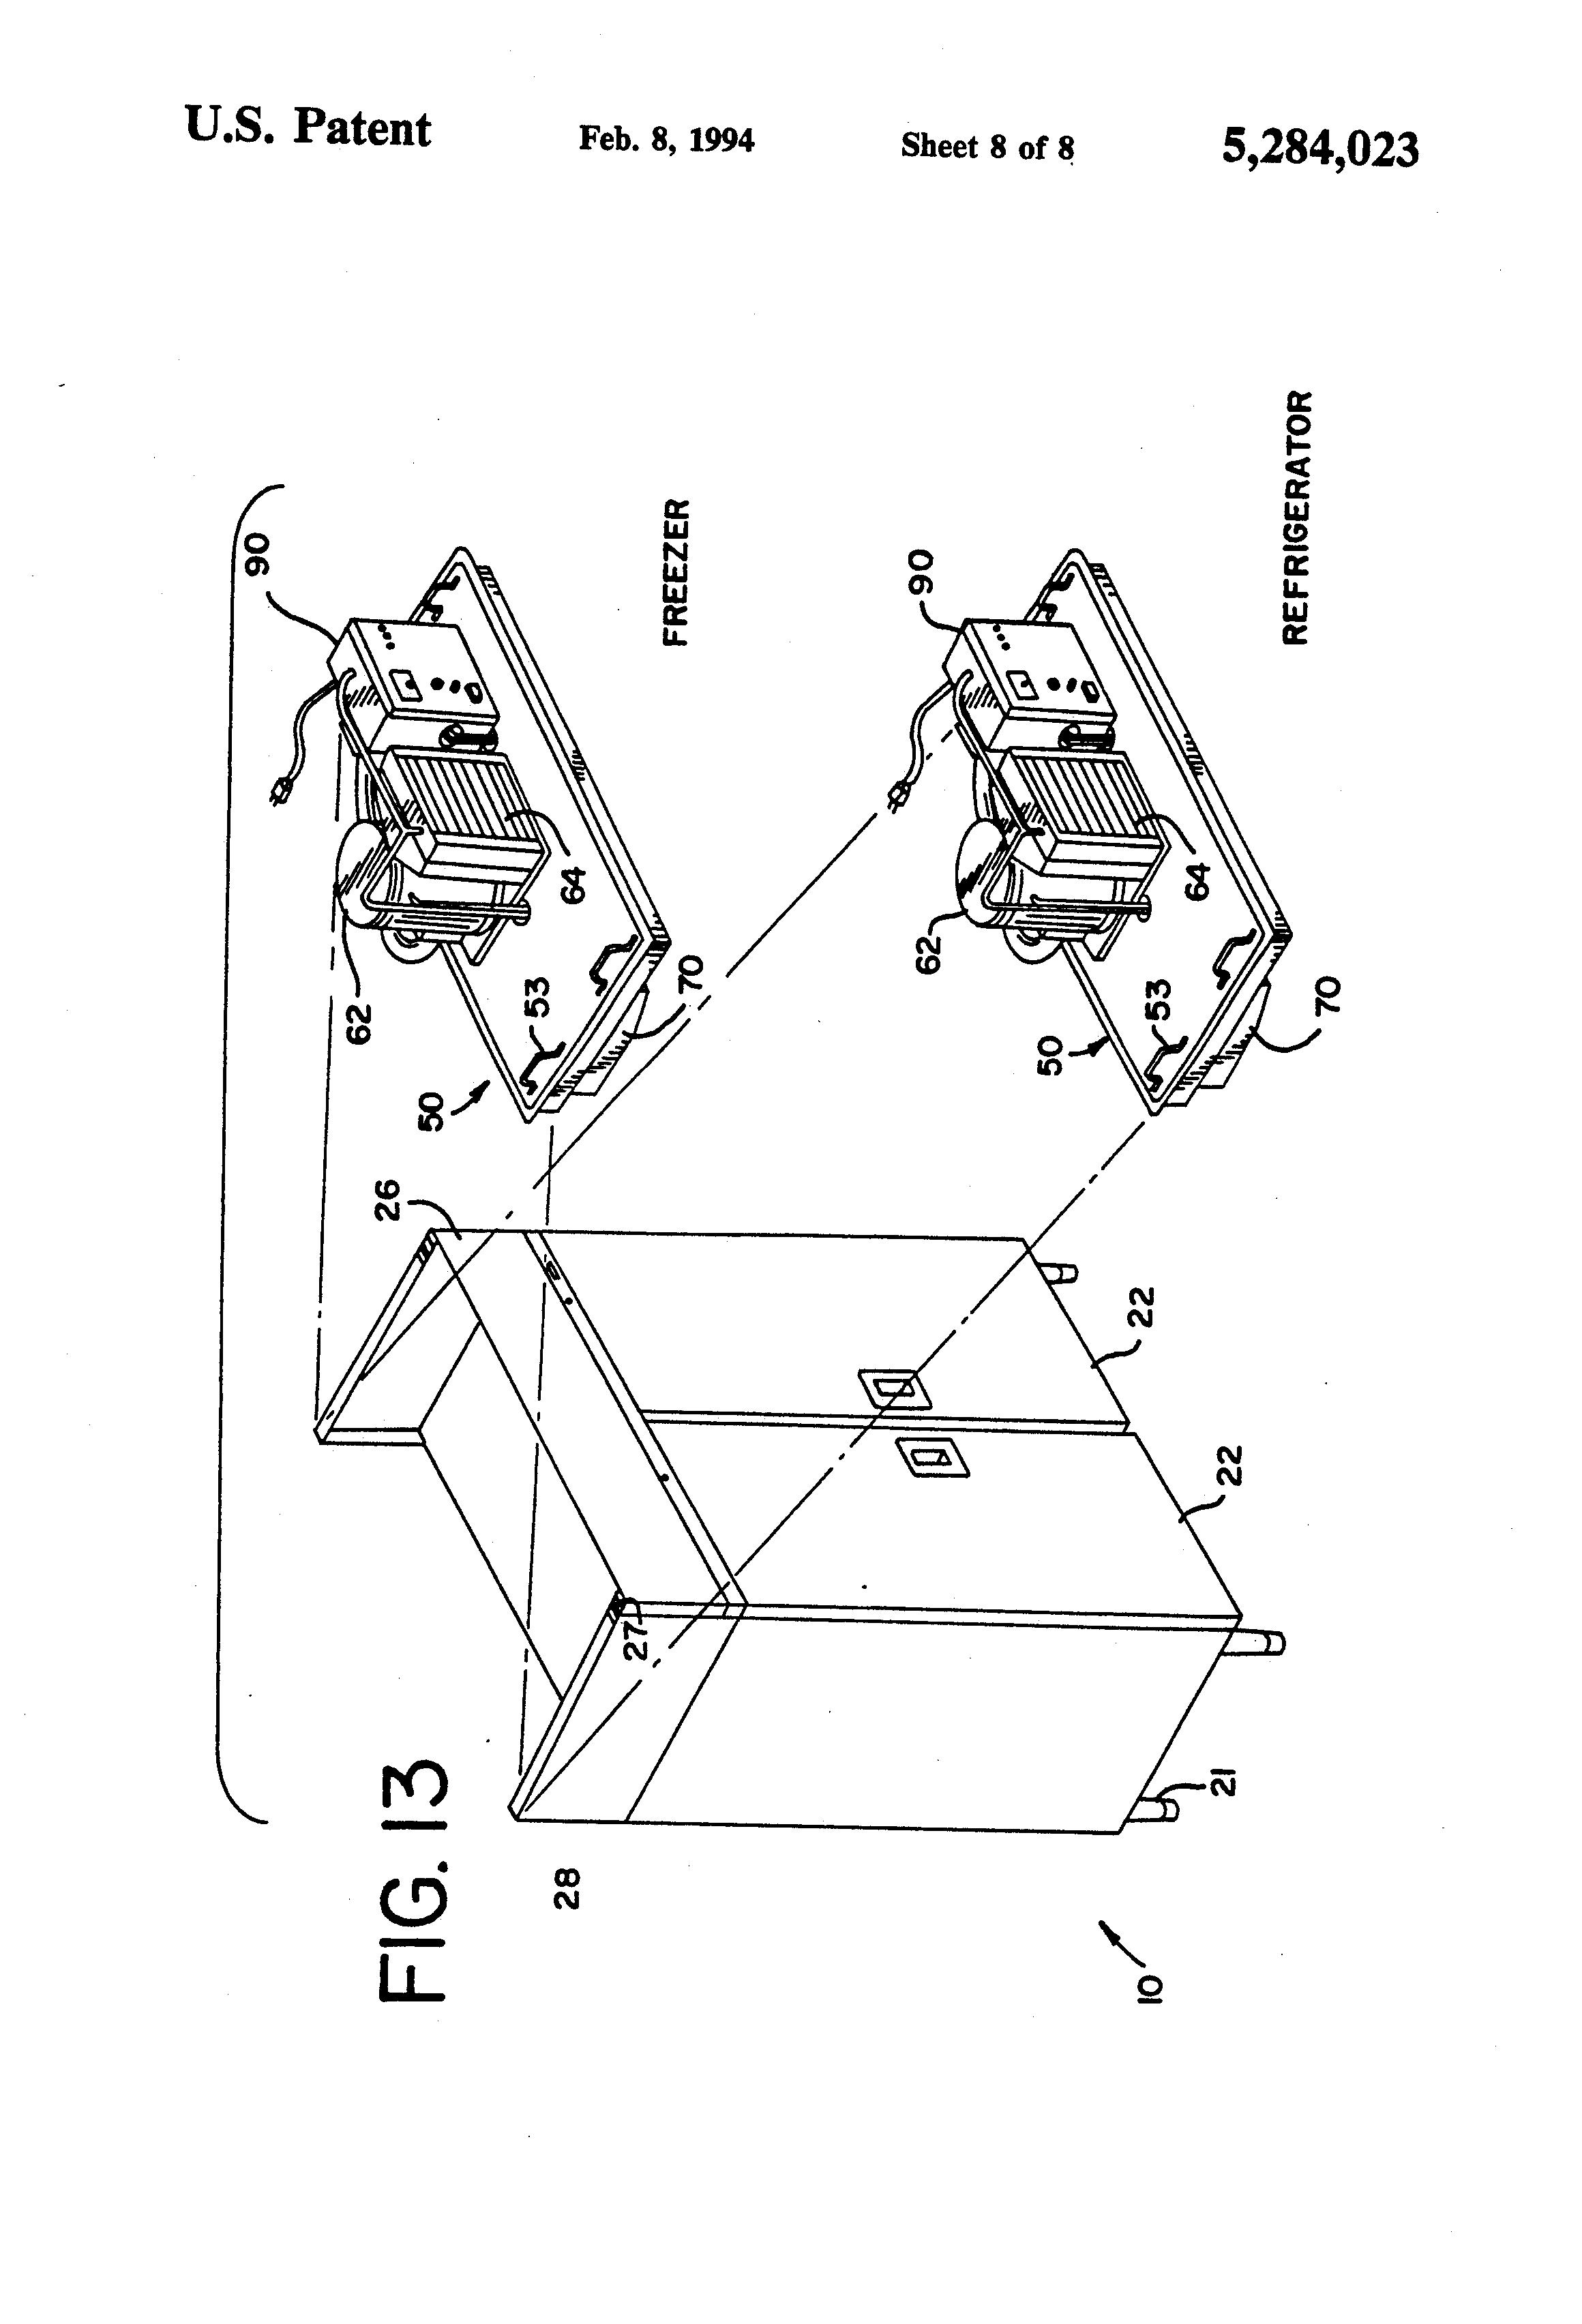 Traulsen Freezer Wiring Diagram Bots Aht232nut Sundash Diagrams Trusted G12010